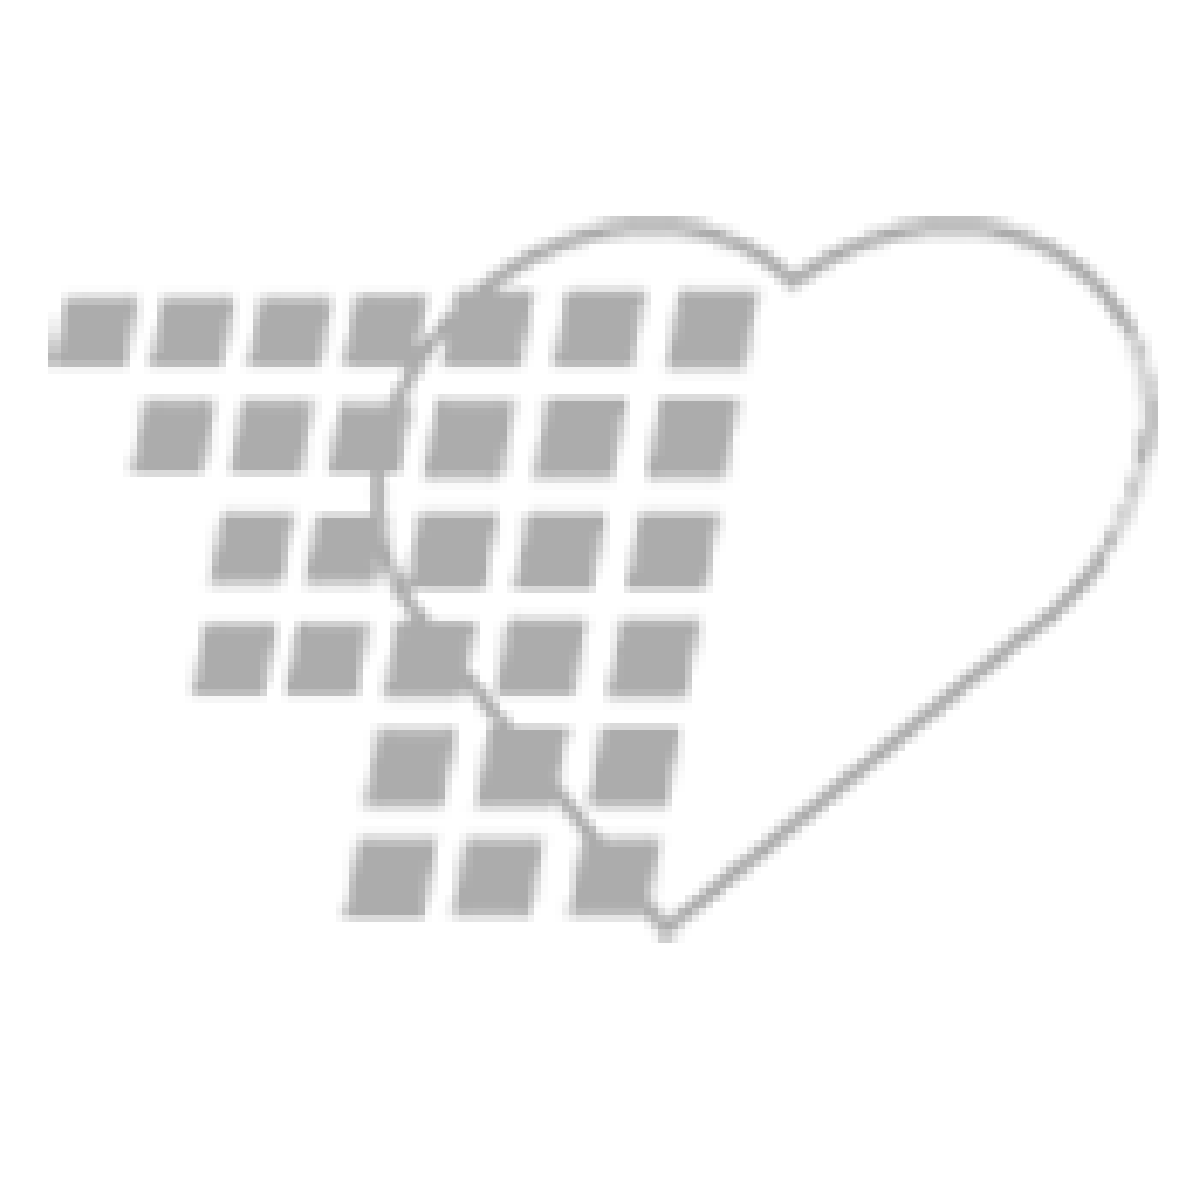 06-93-9010 - Demo Dose® Vistarl (HydrOXYzin Paomat) 2mL 100mg/2mL